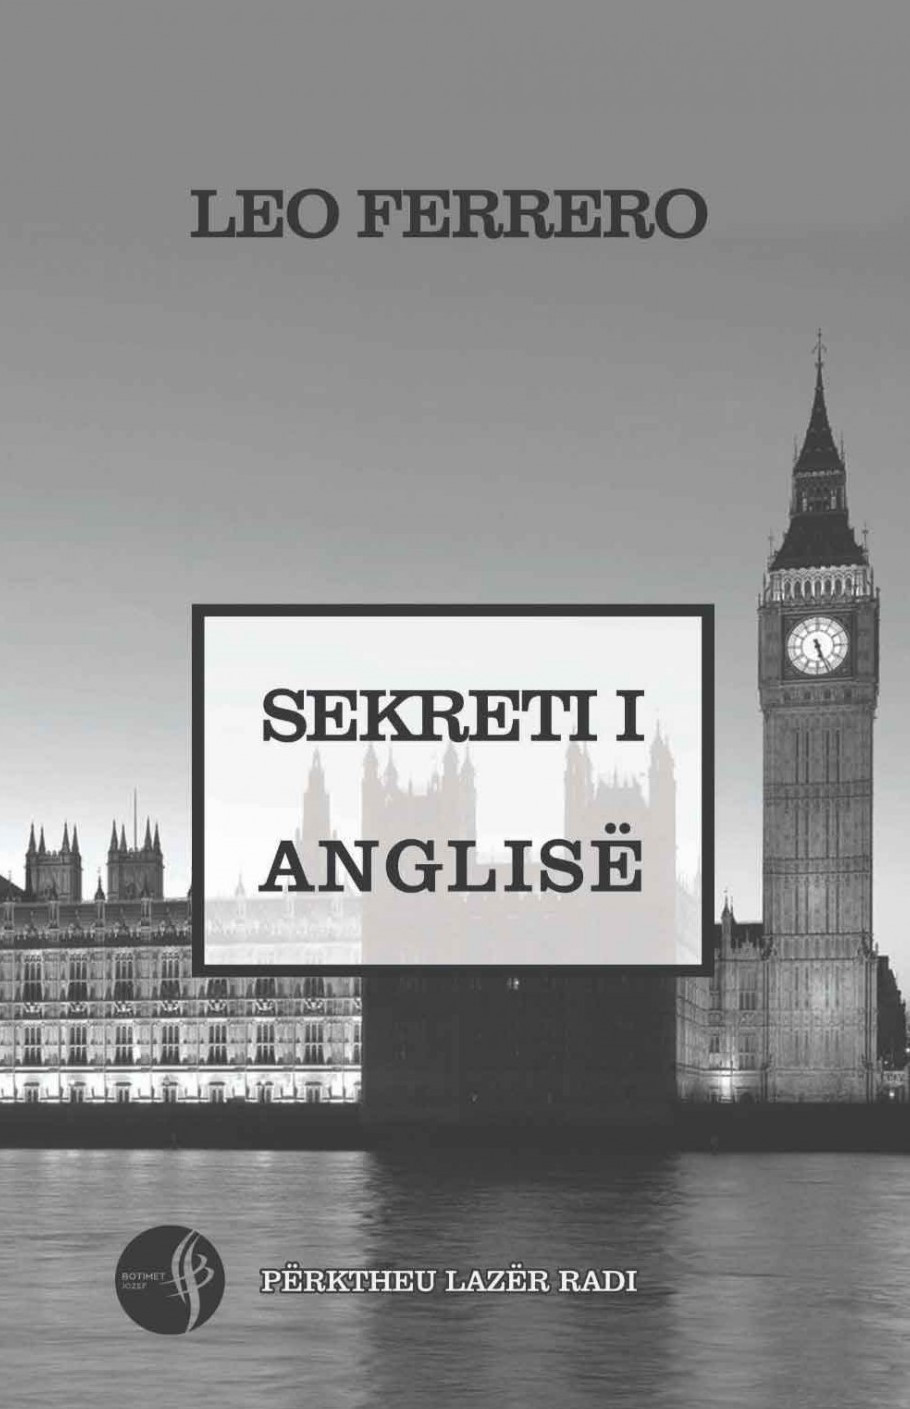 Sekreti i Anglise